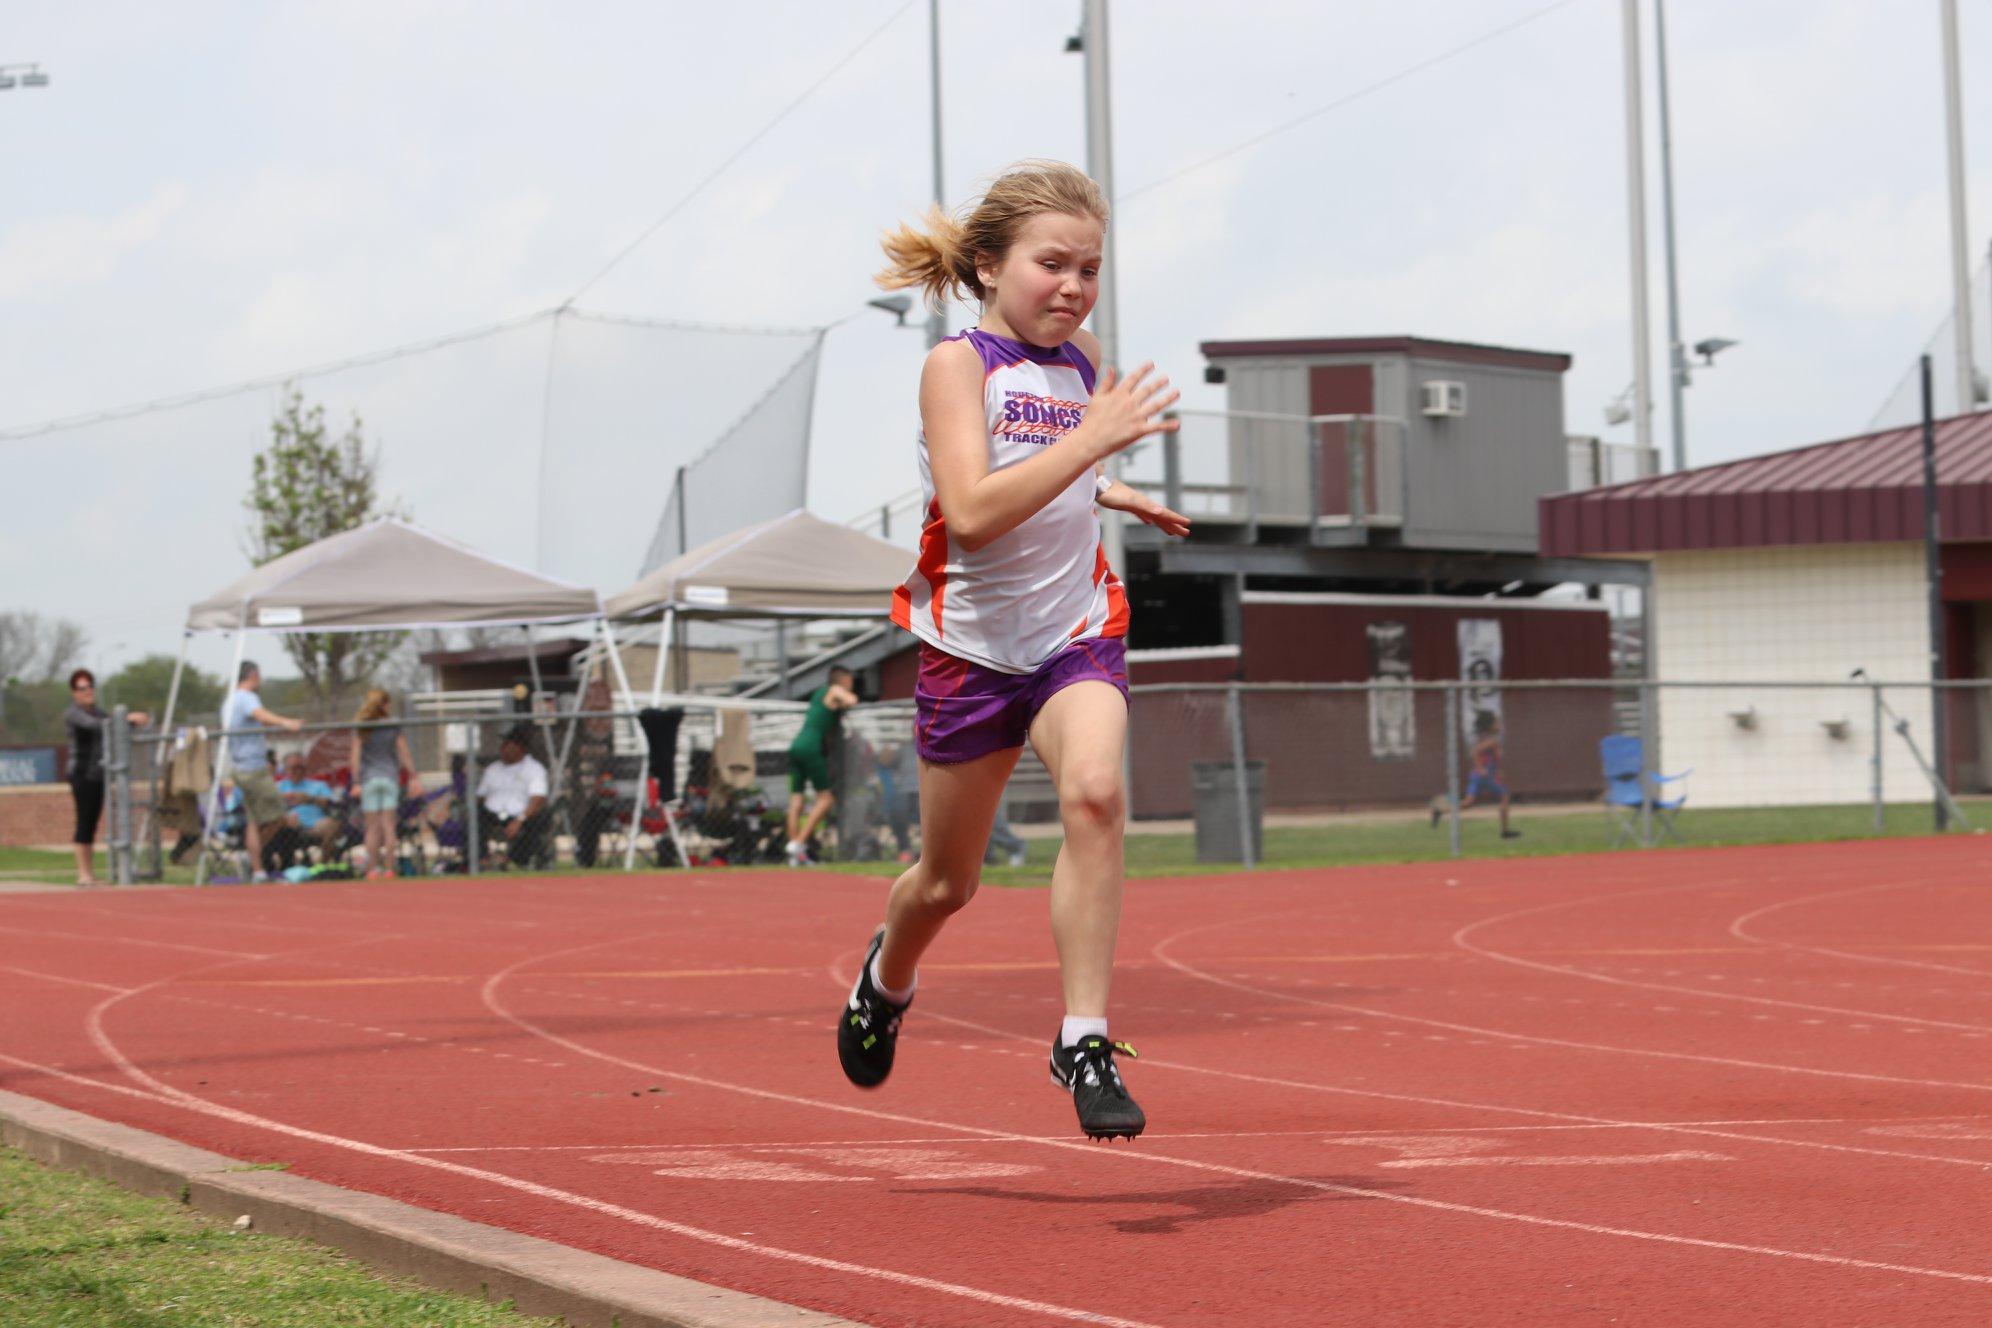 Macyn_running the 400